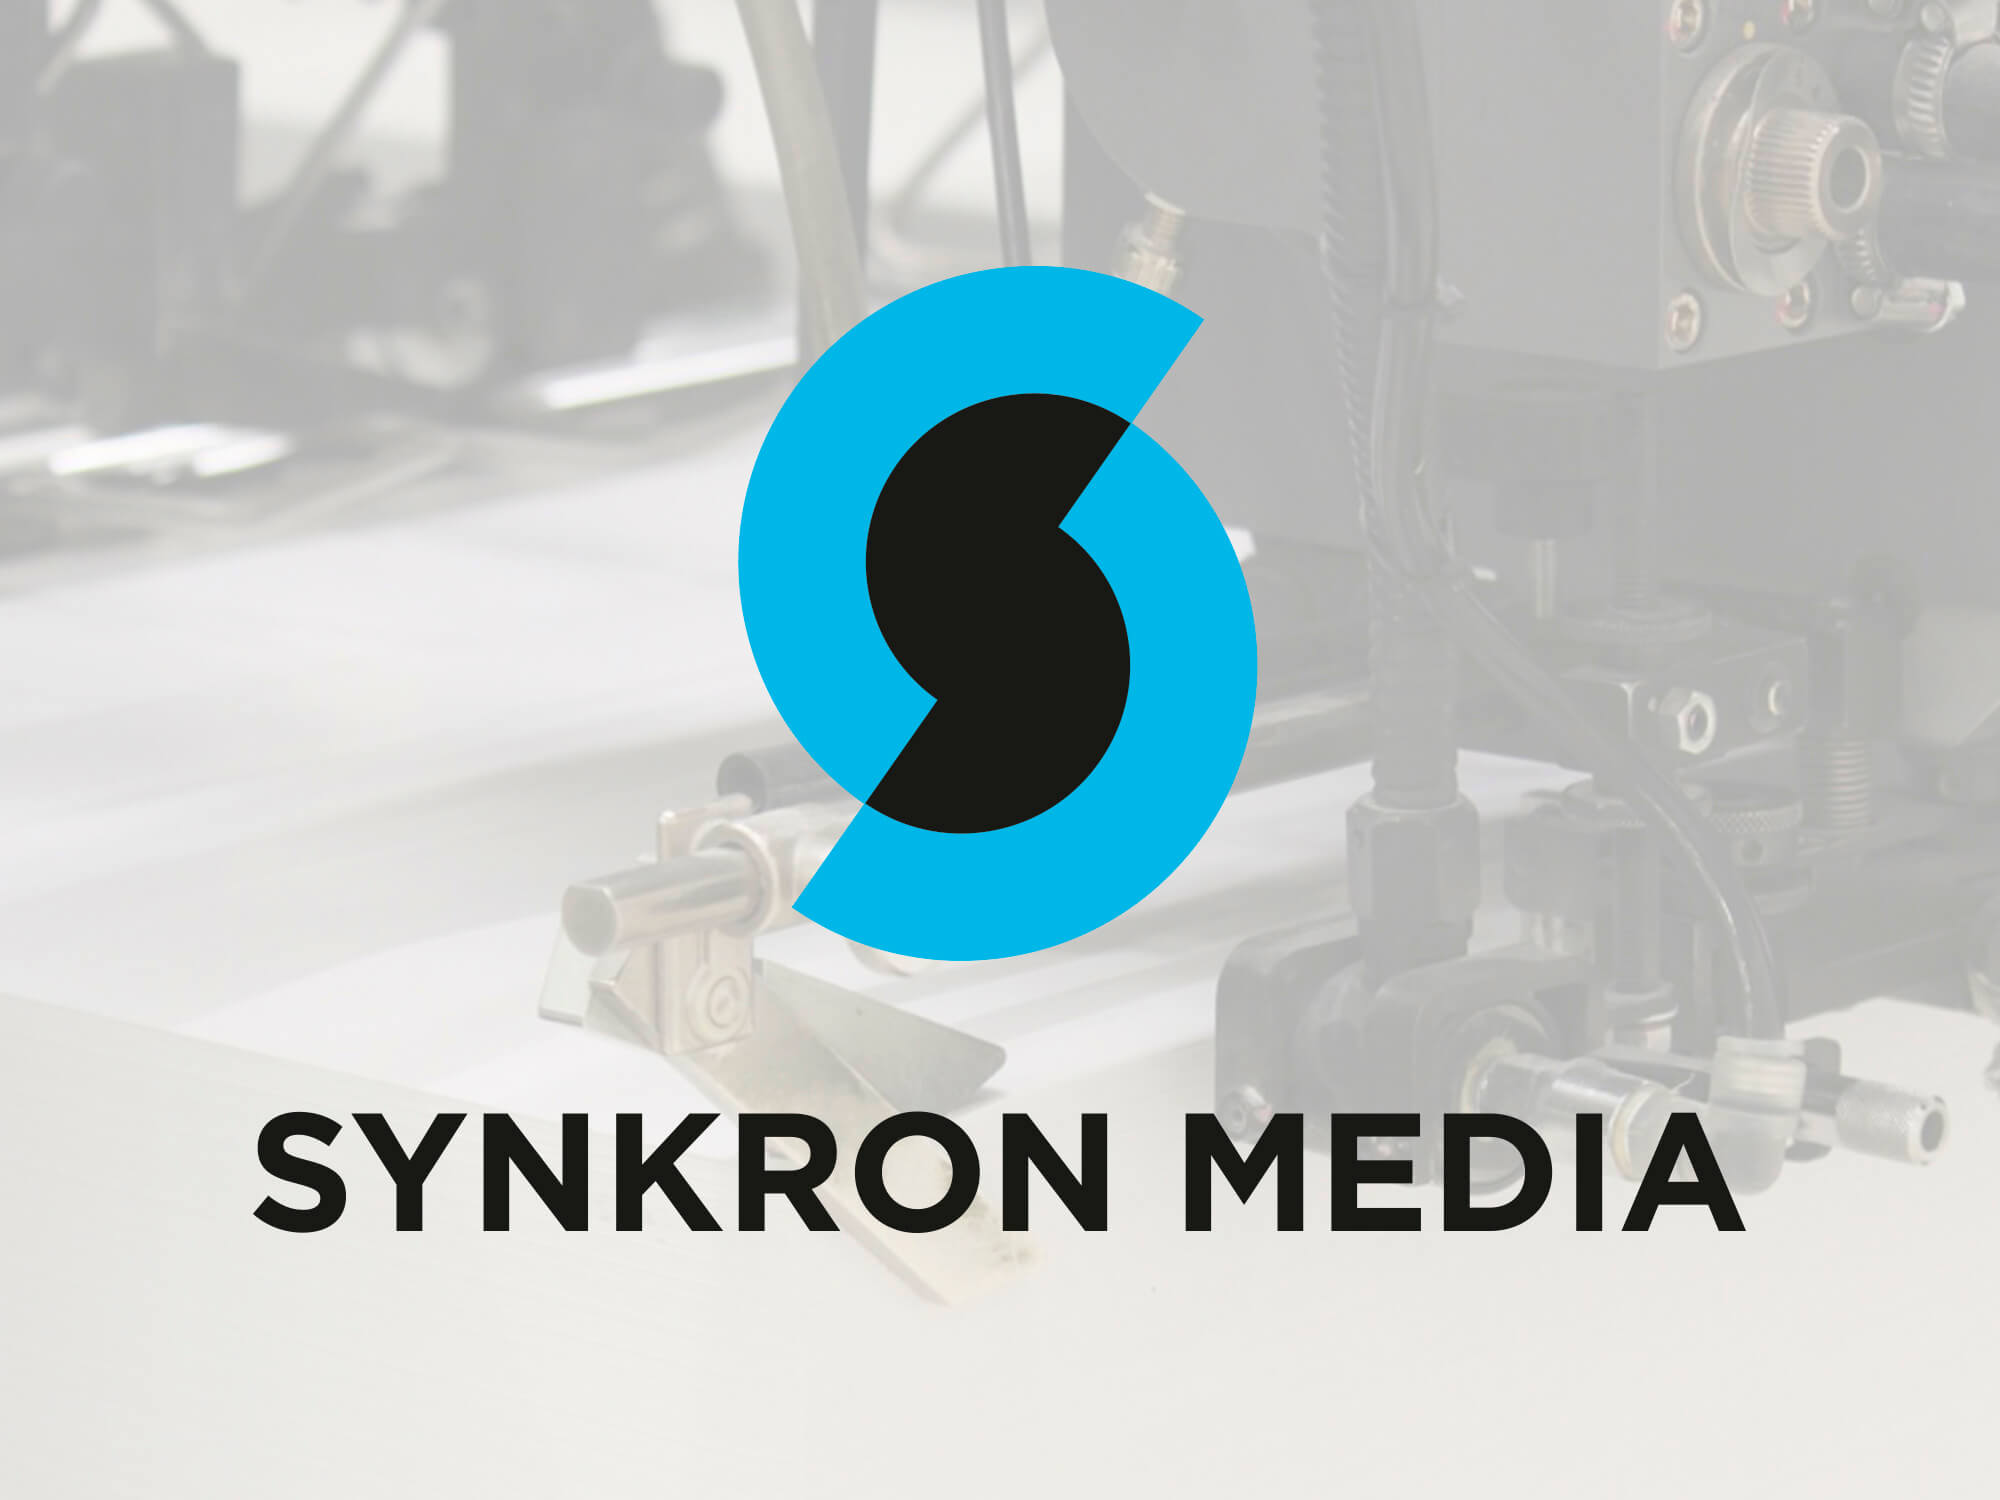 Synkron Media